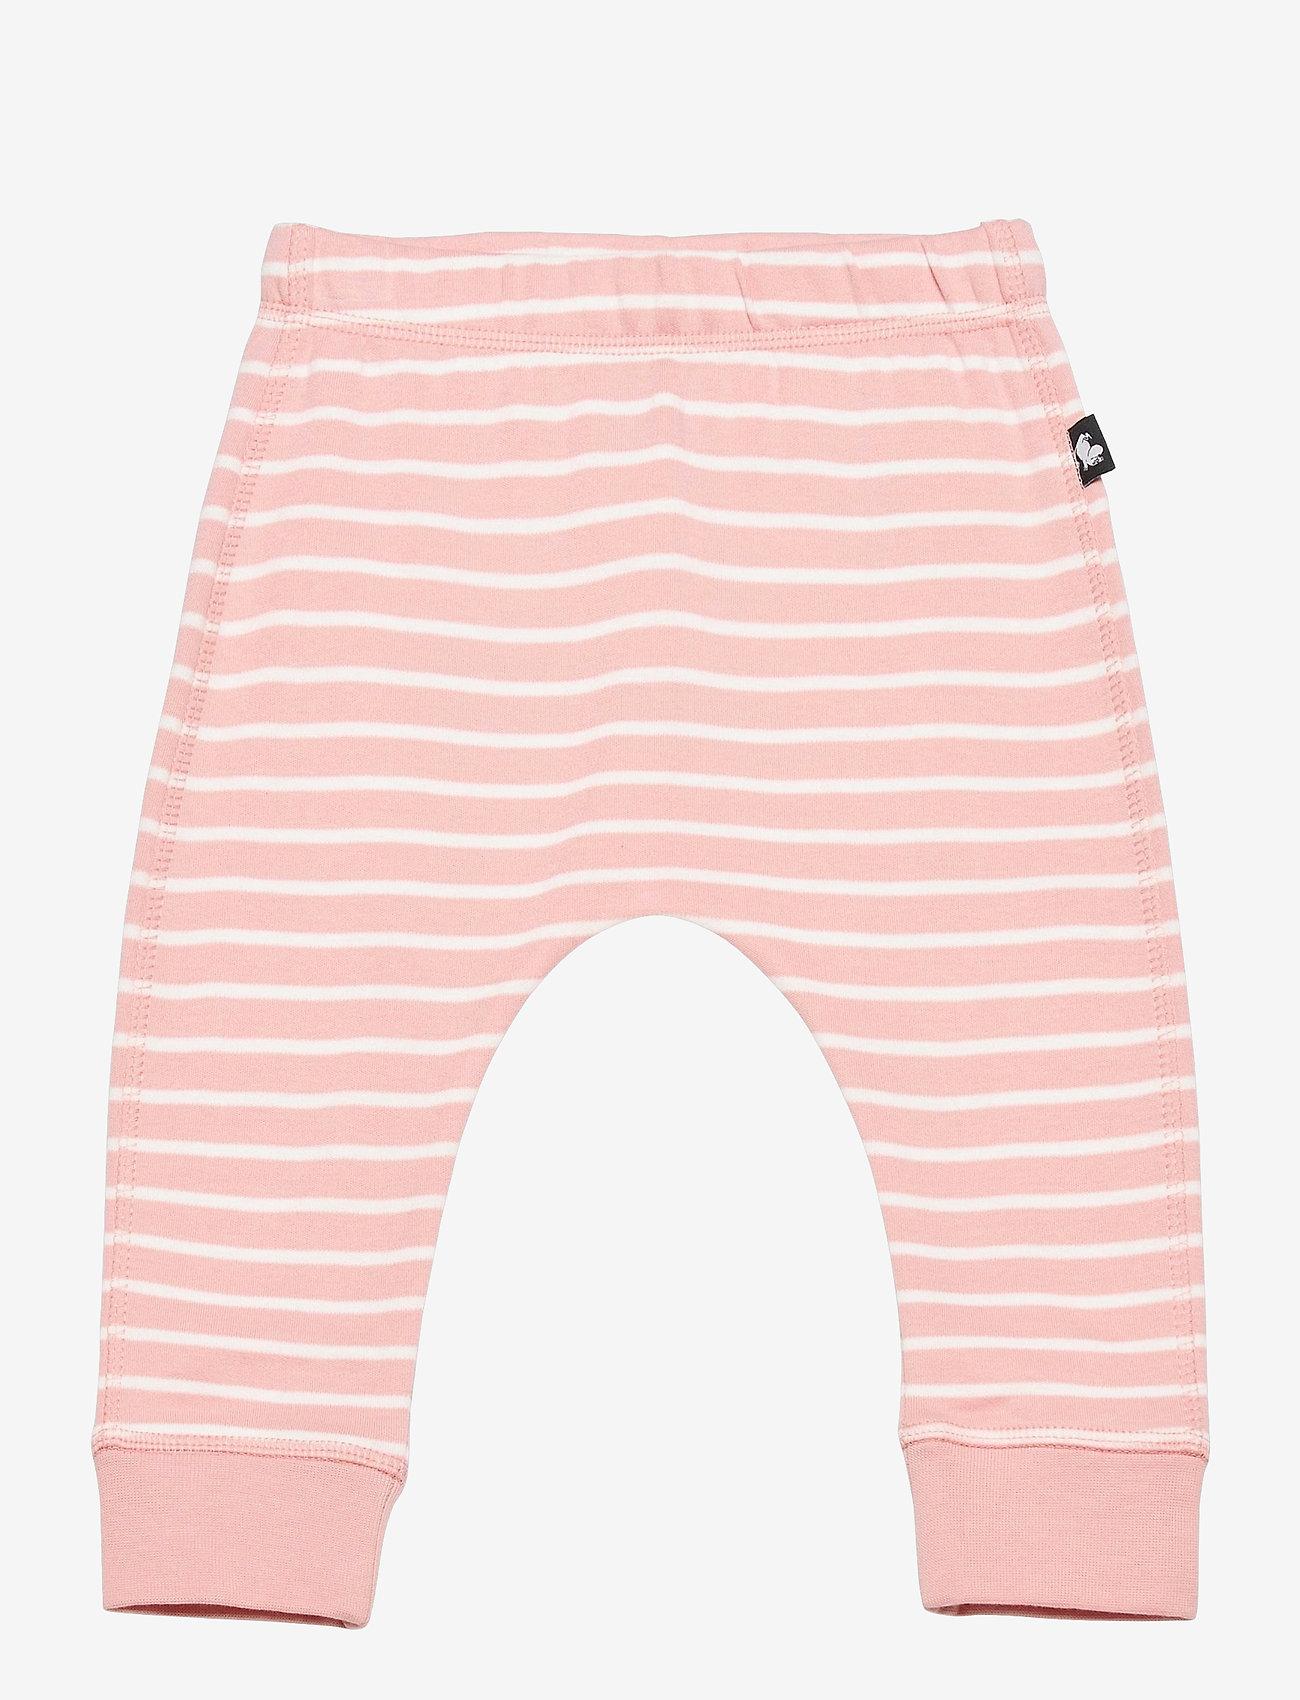 Reima - Moomin Benen - trousers - soft peach - 0